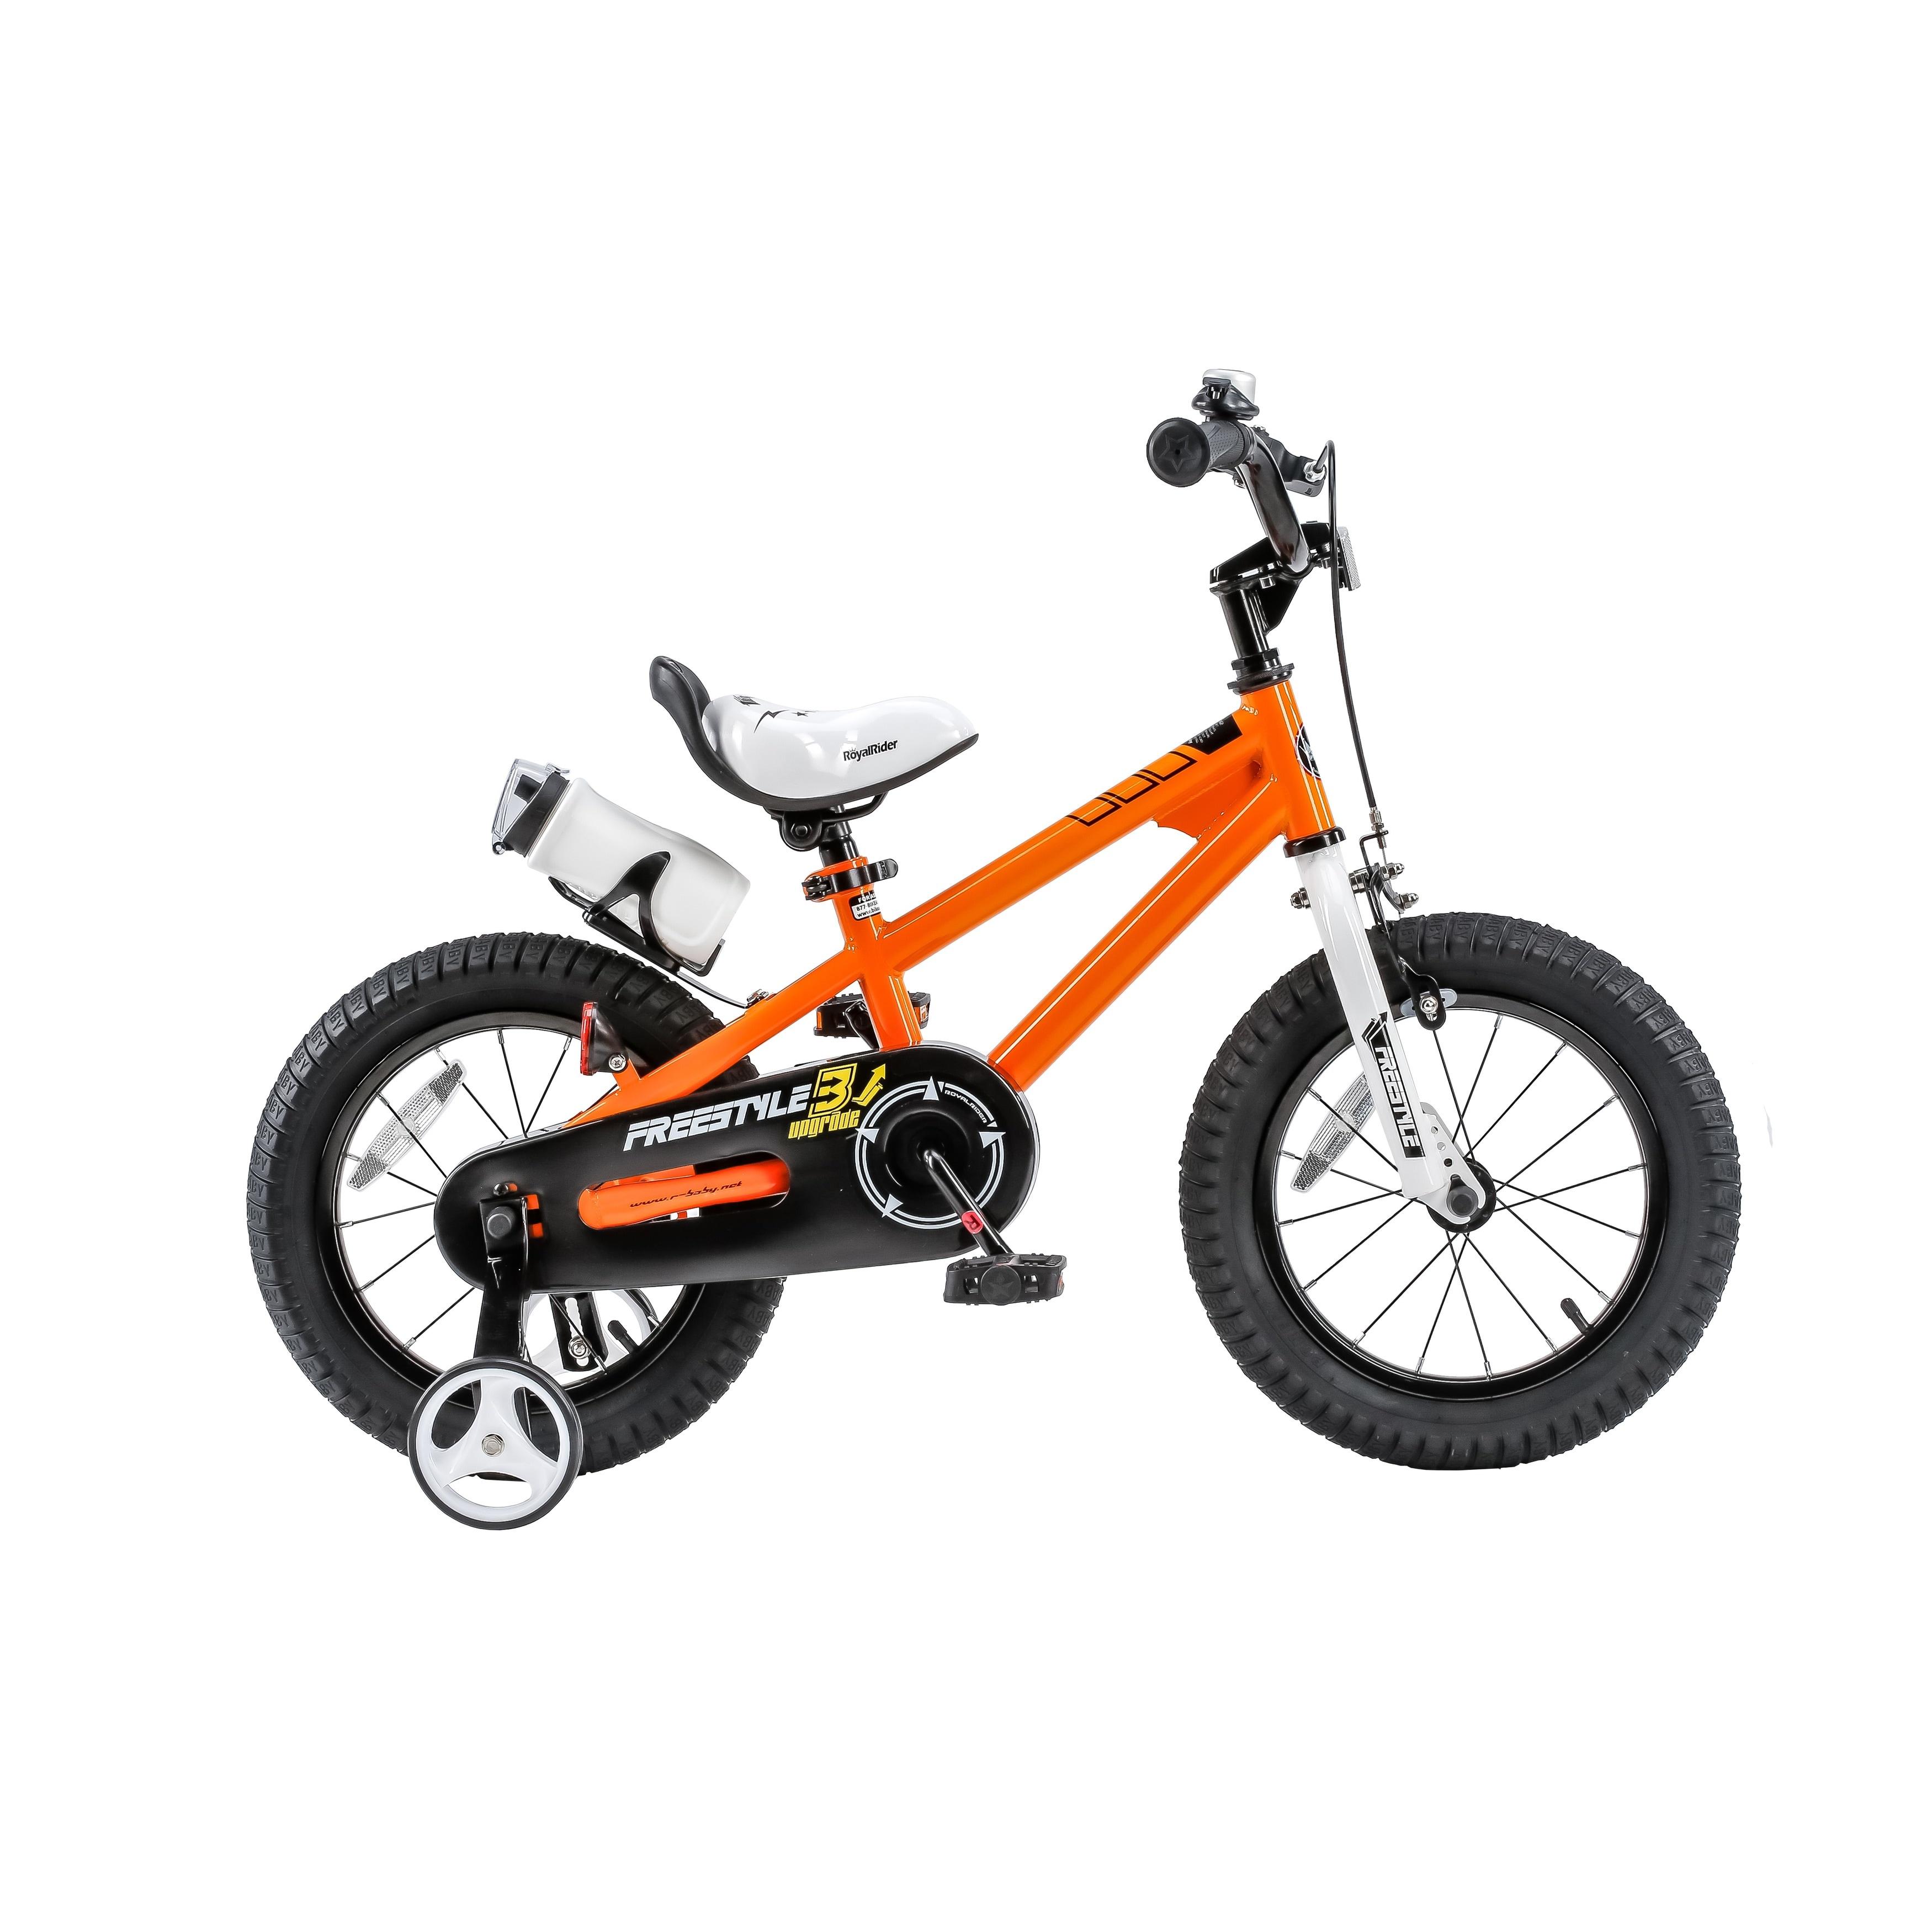 94e232d9df5 Royalbaby Bmx Freestyle 12 Inch Kids Bike With Training Wheels Ebay